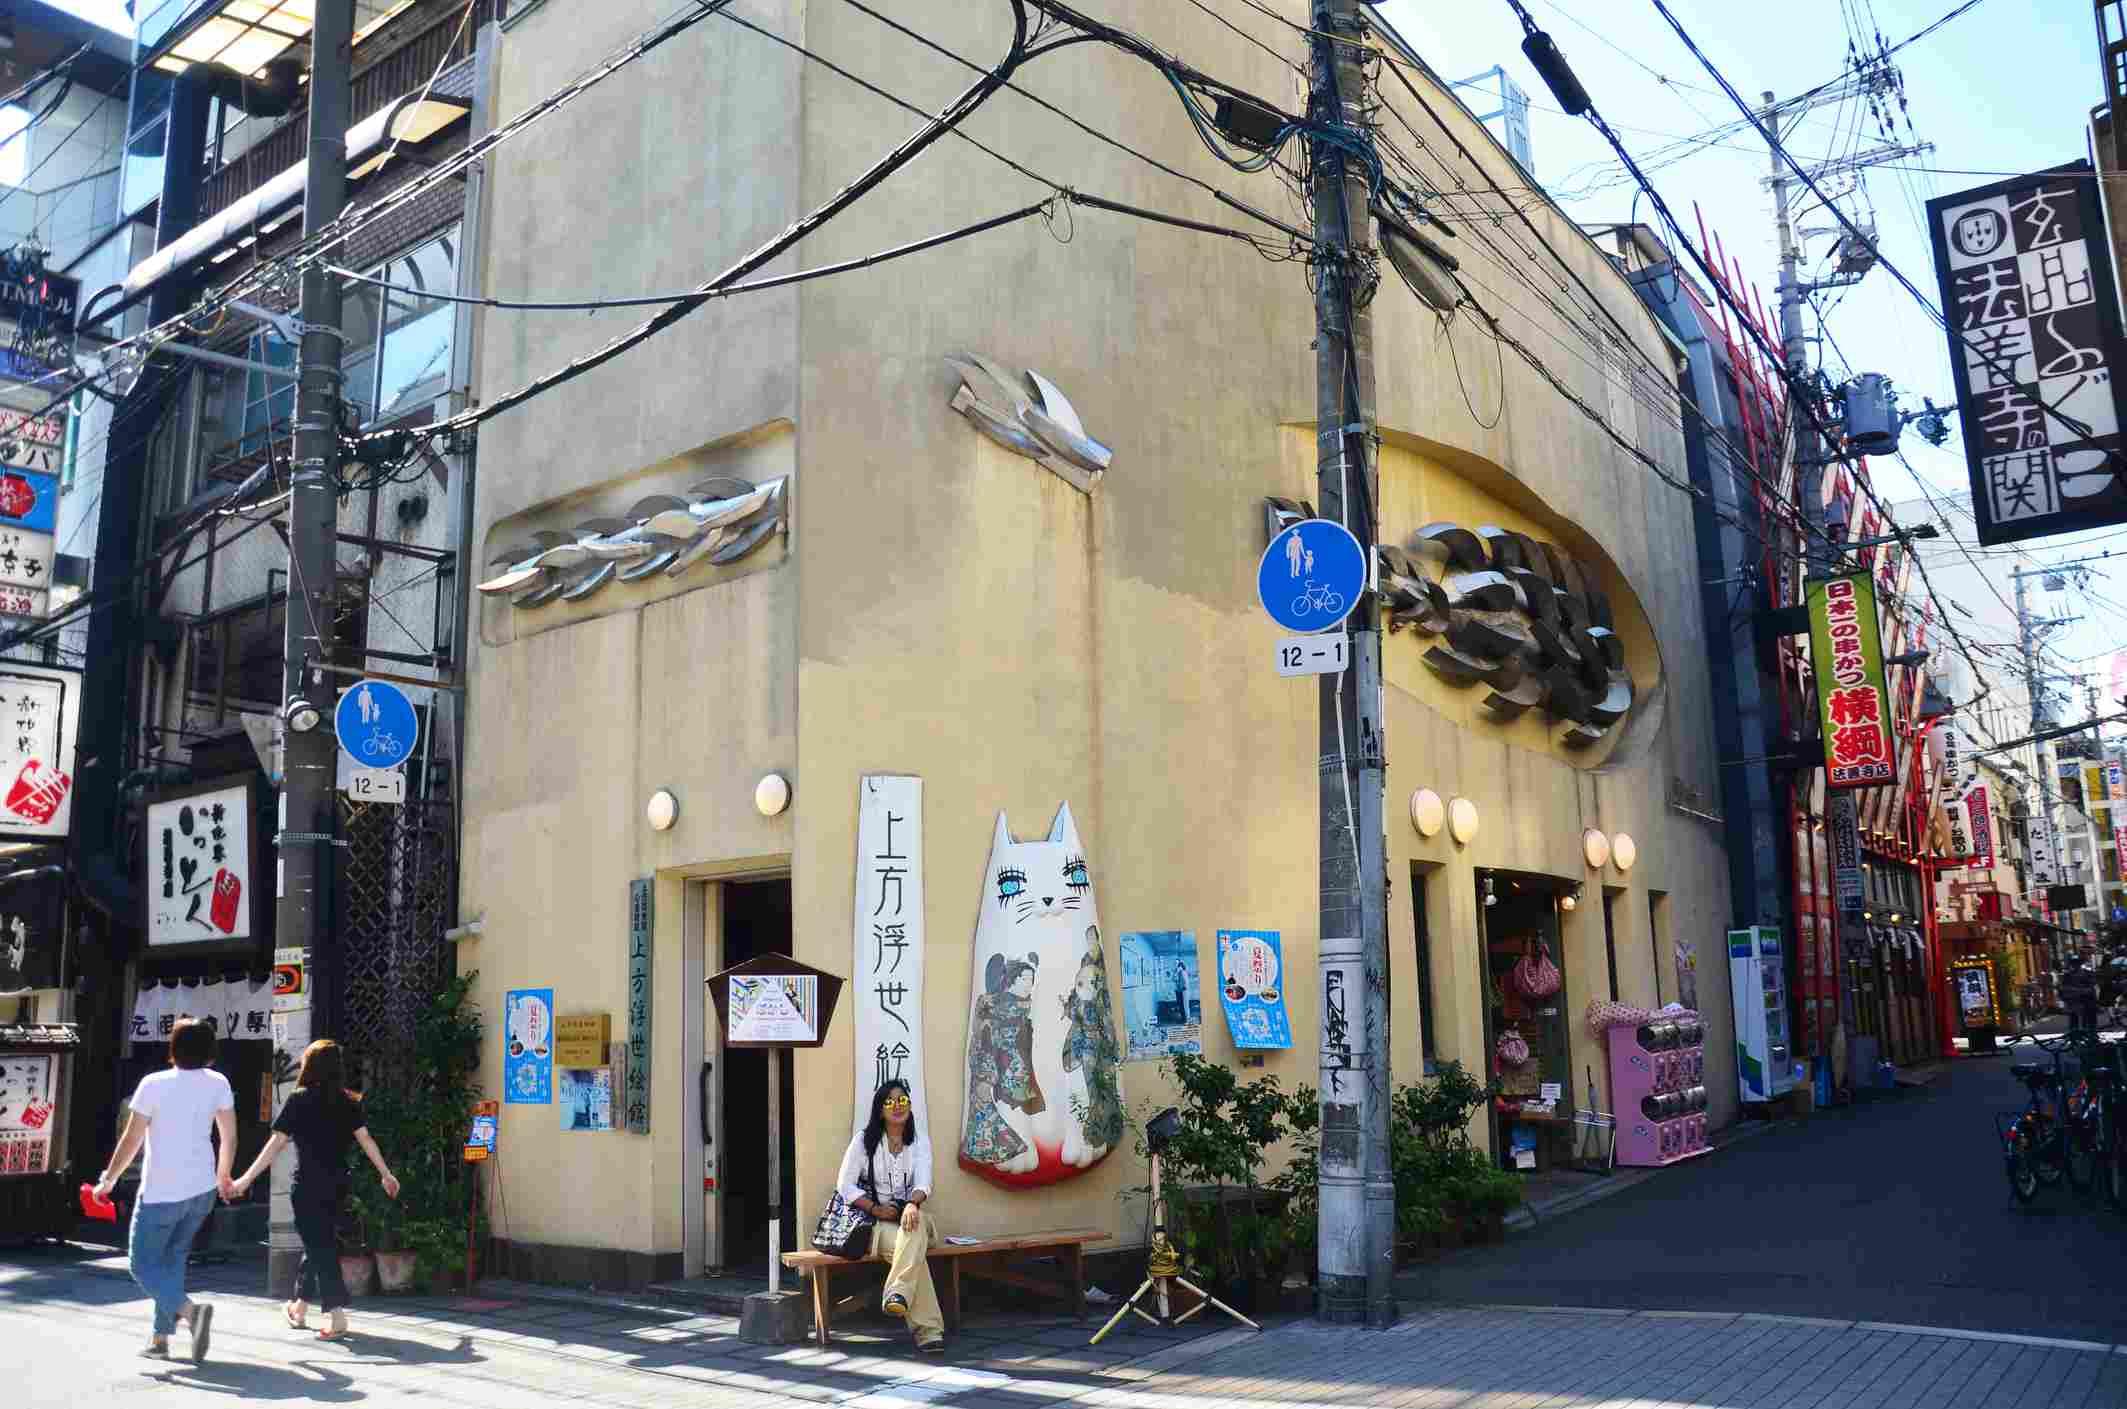 Kamigata Ukiyoe Museum in Osaka, Japan